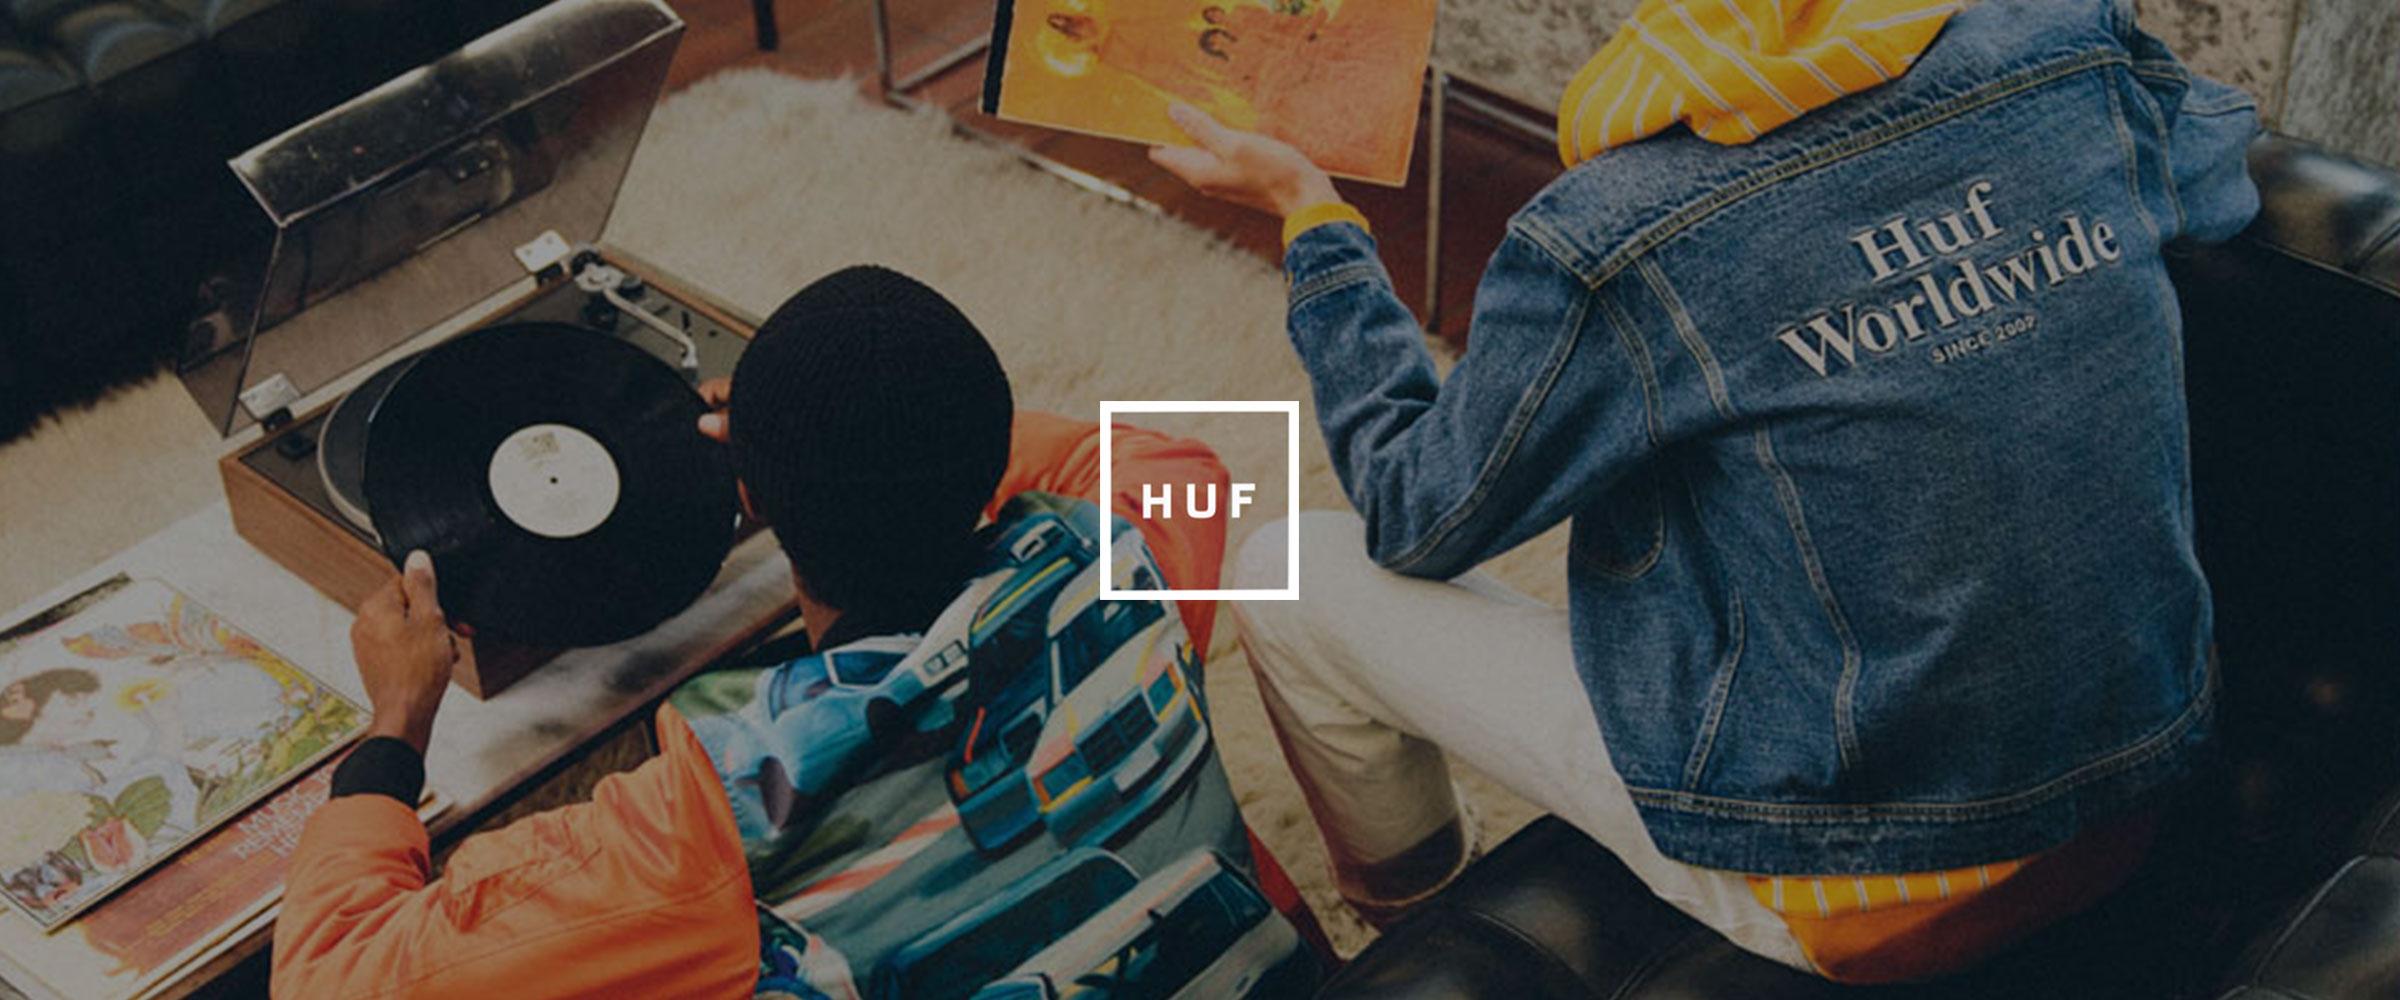 huf_2.jpg